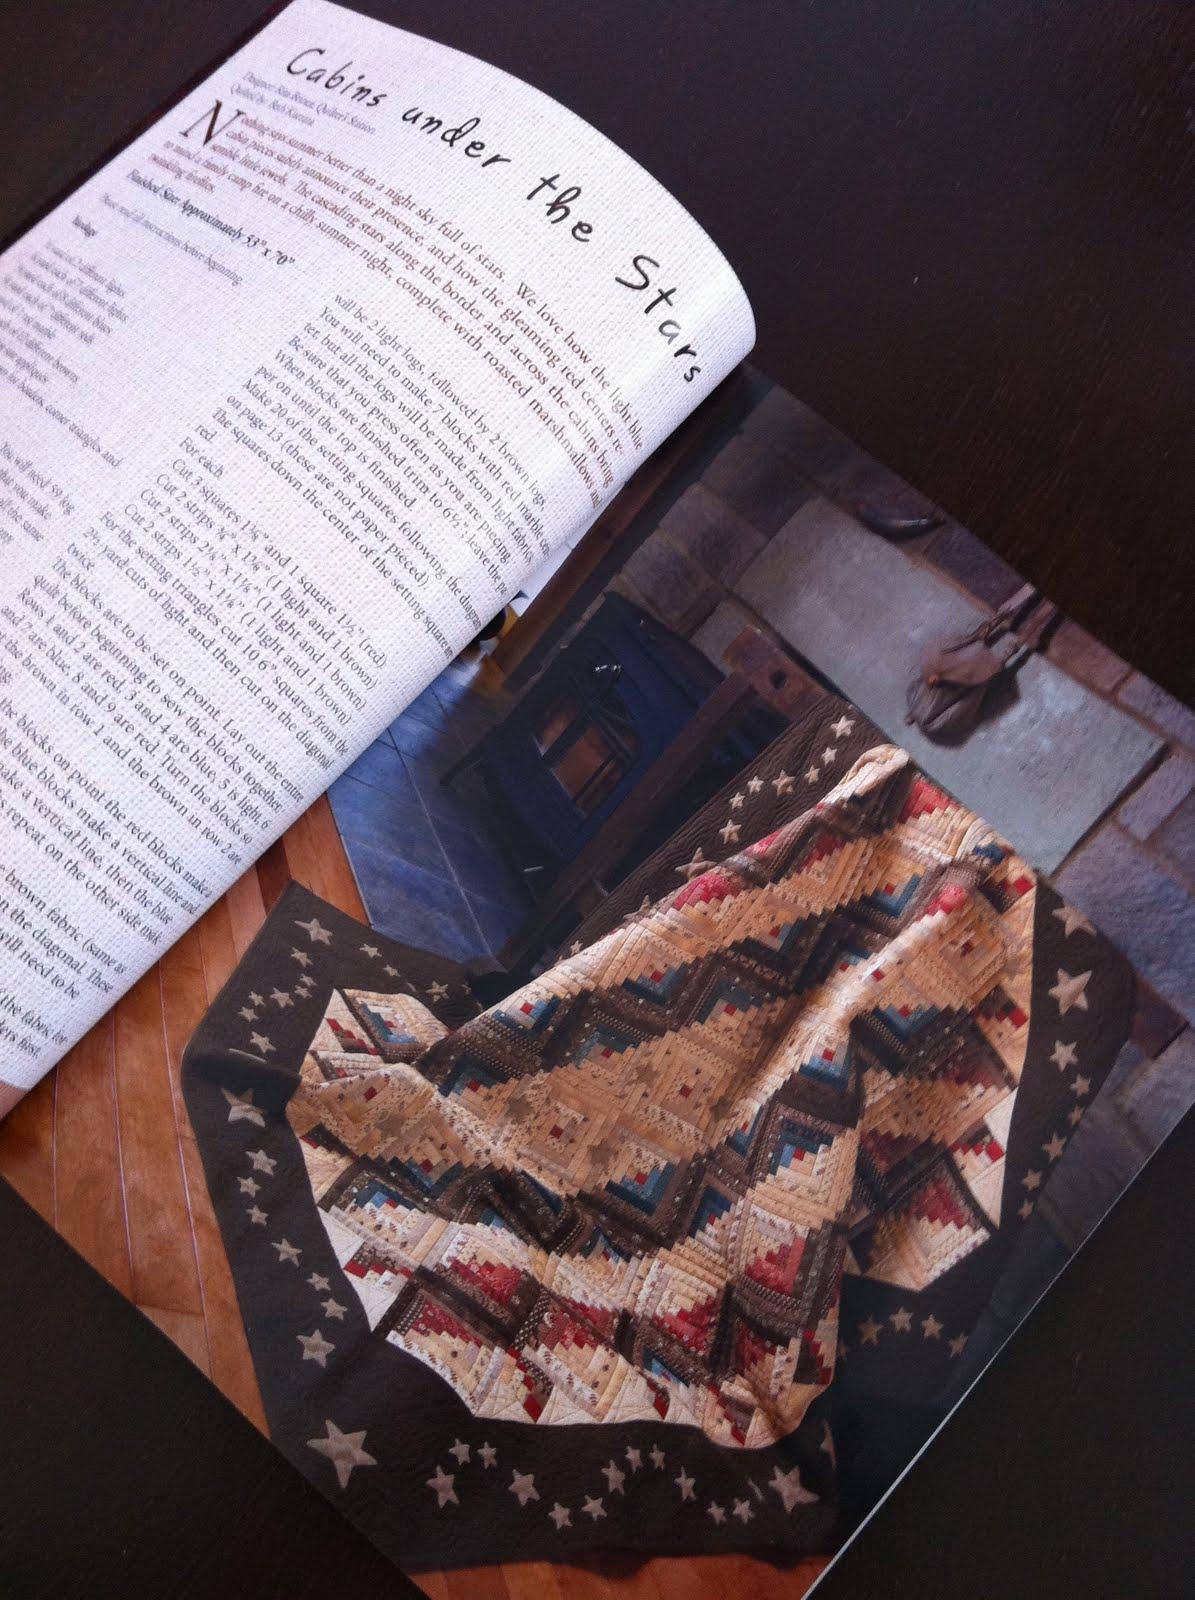 Quiltwel primitive quilts projects - Tijdschrift chic huis ...